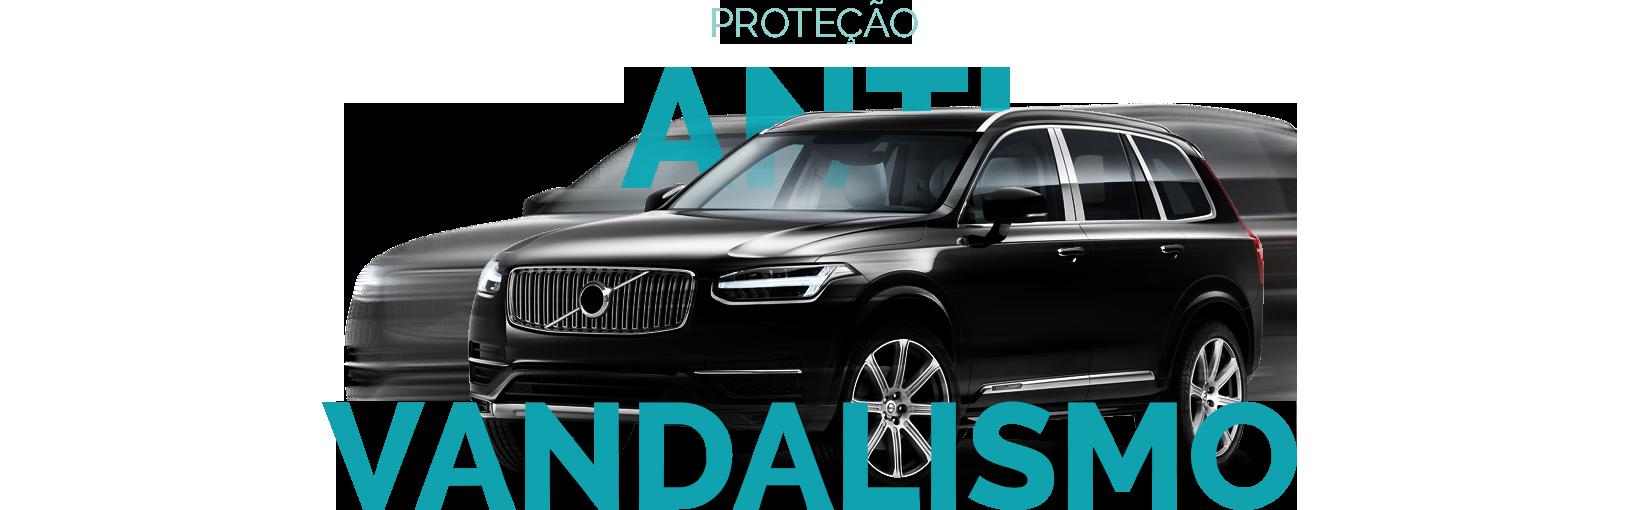 Proteção Anti Vandalismo